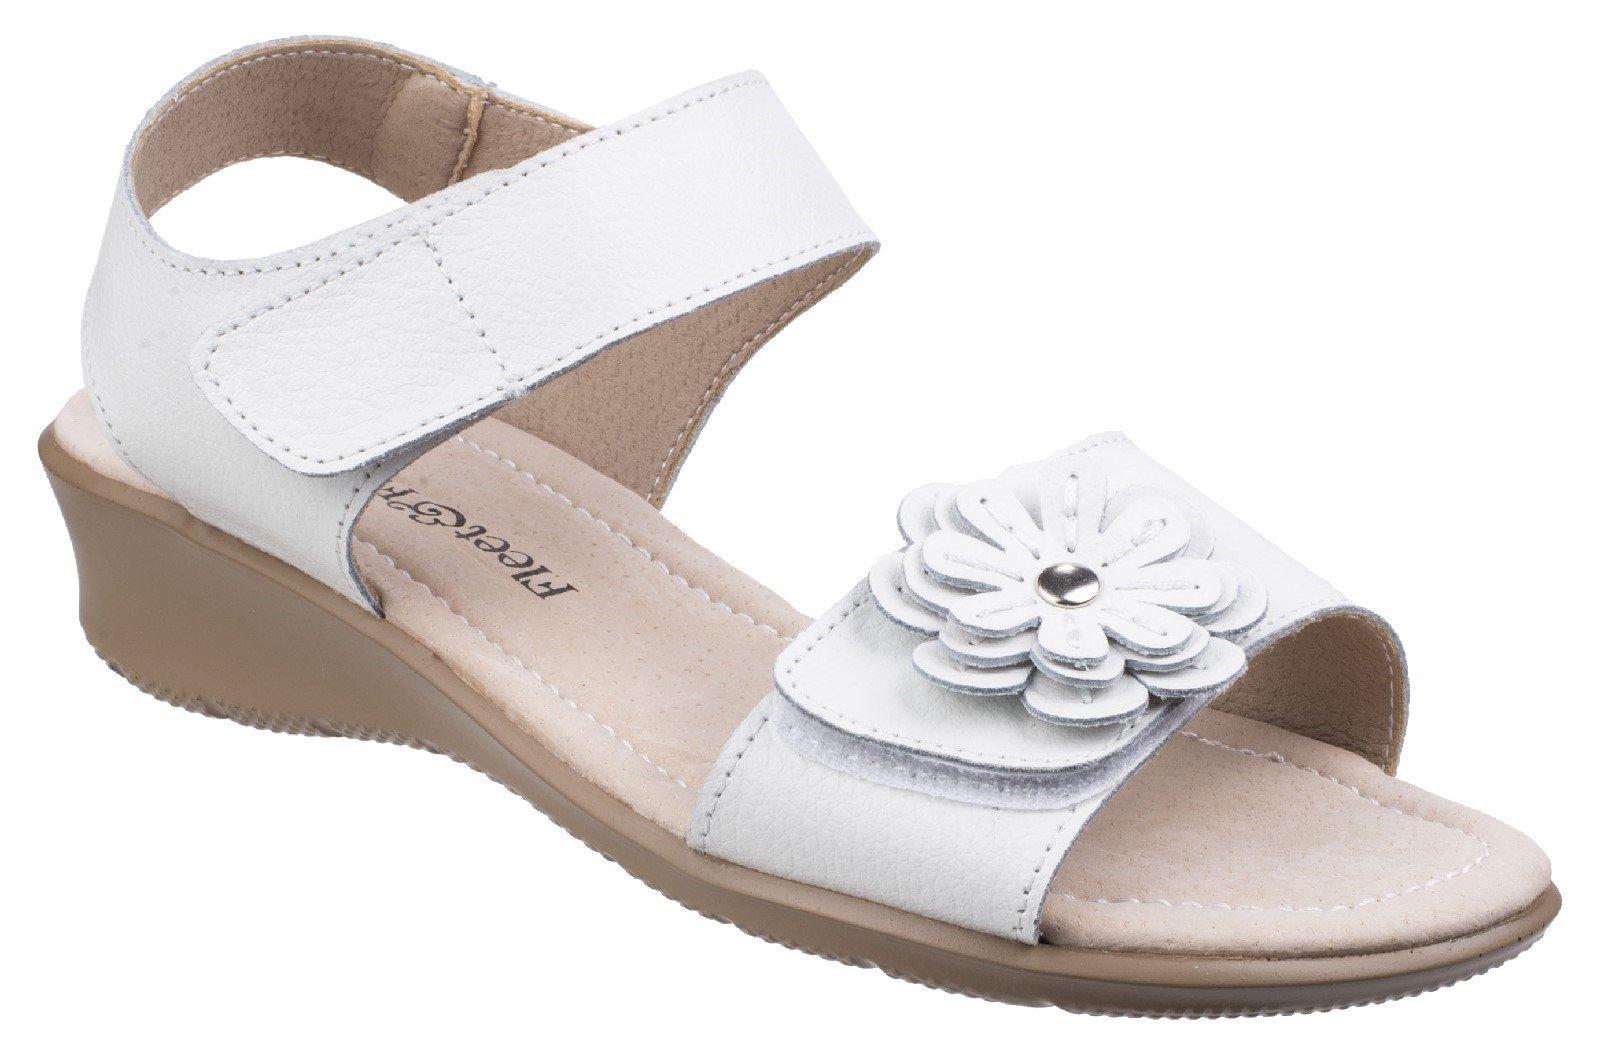 Fleet & Foster Women's Sapphire Touch Sandal Various Colours 26299 - White 3